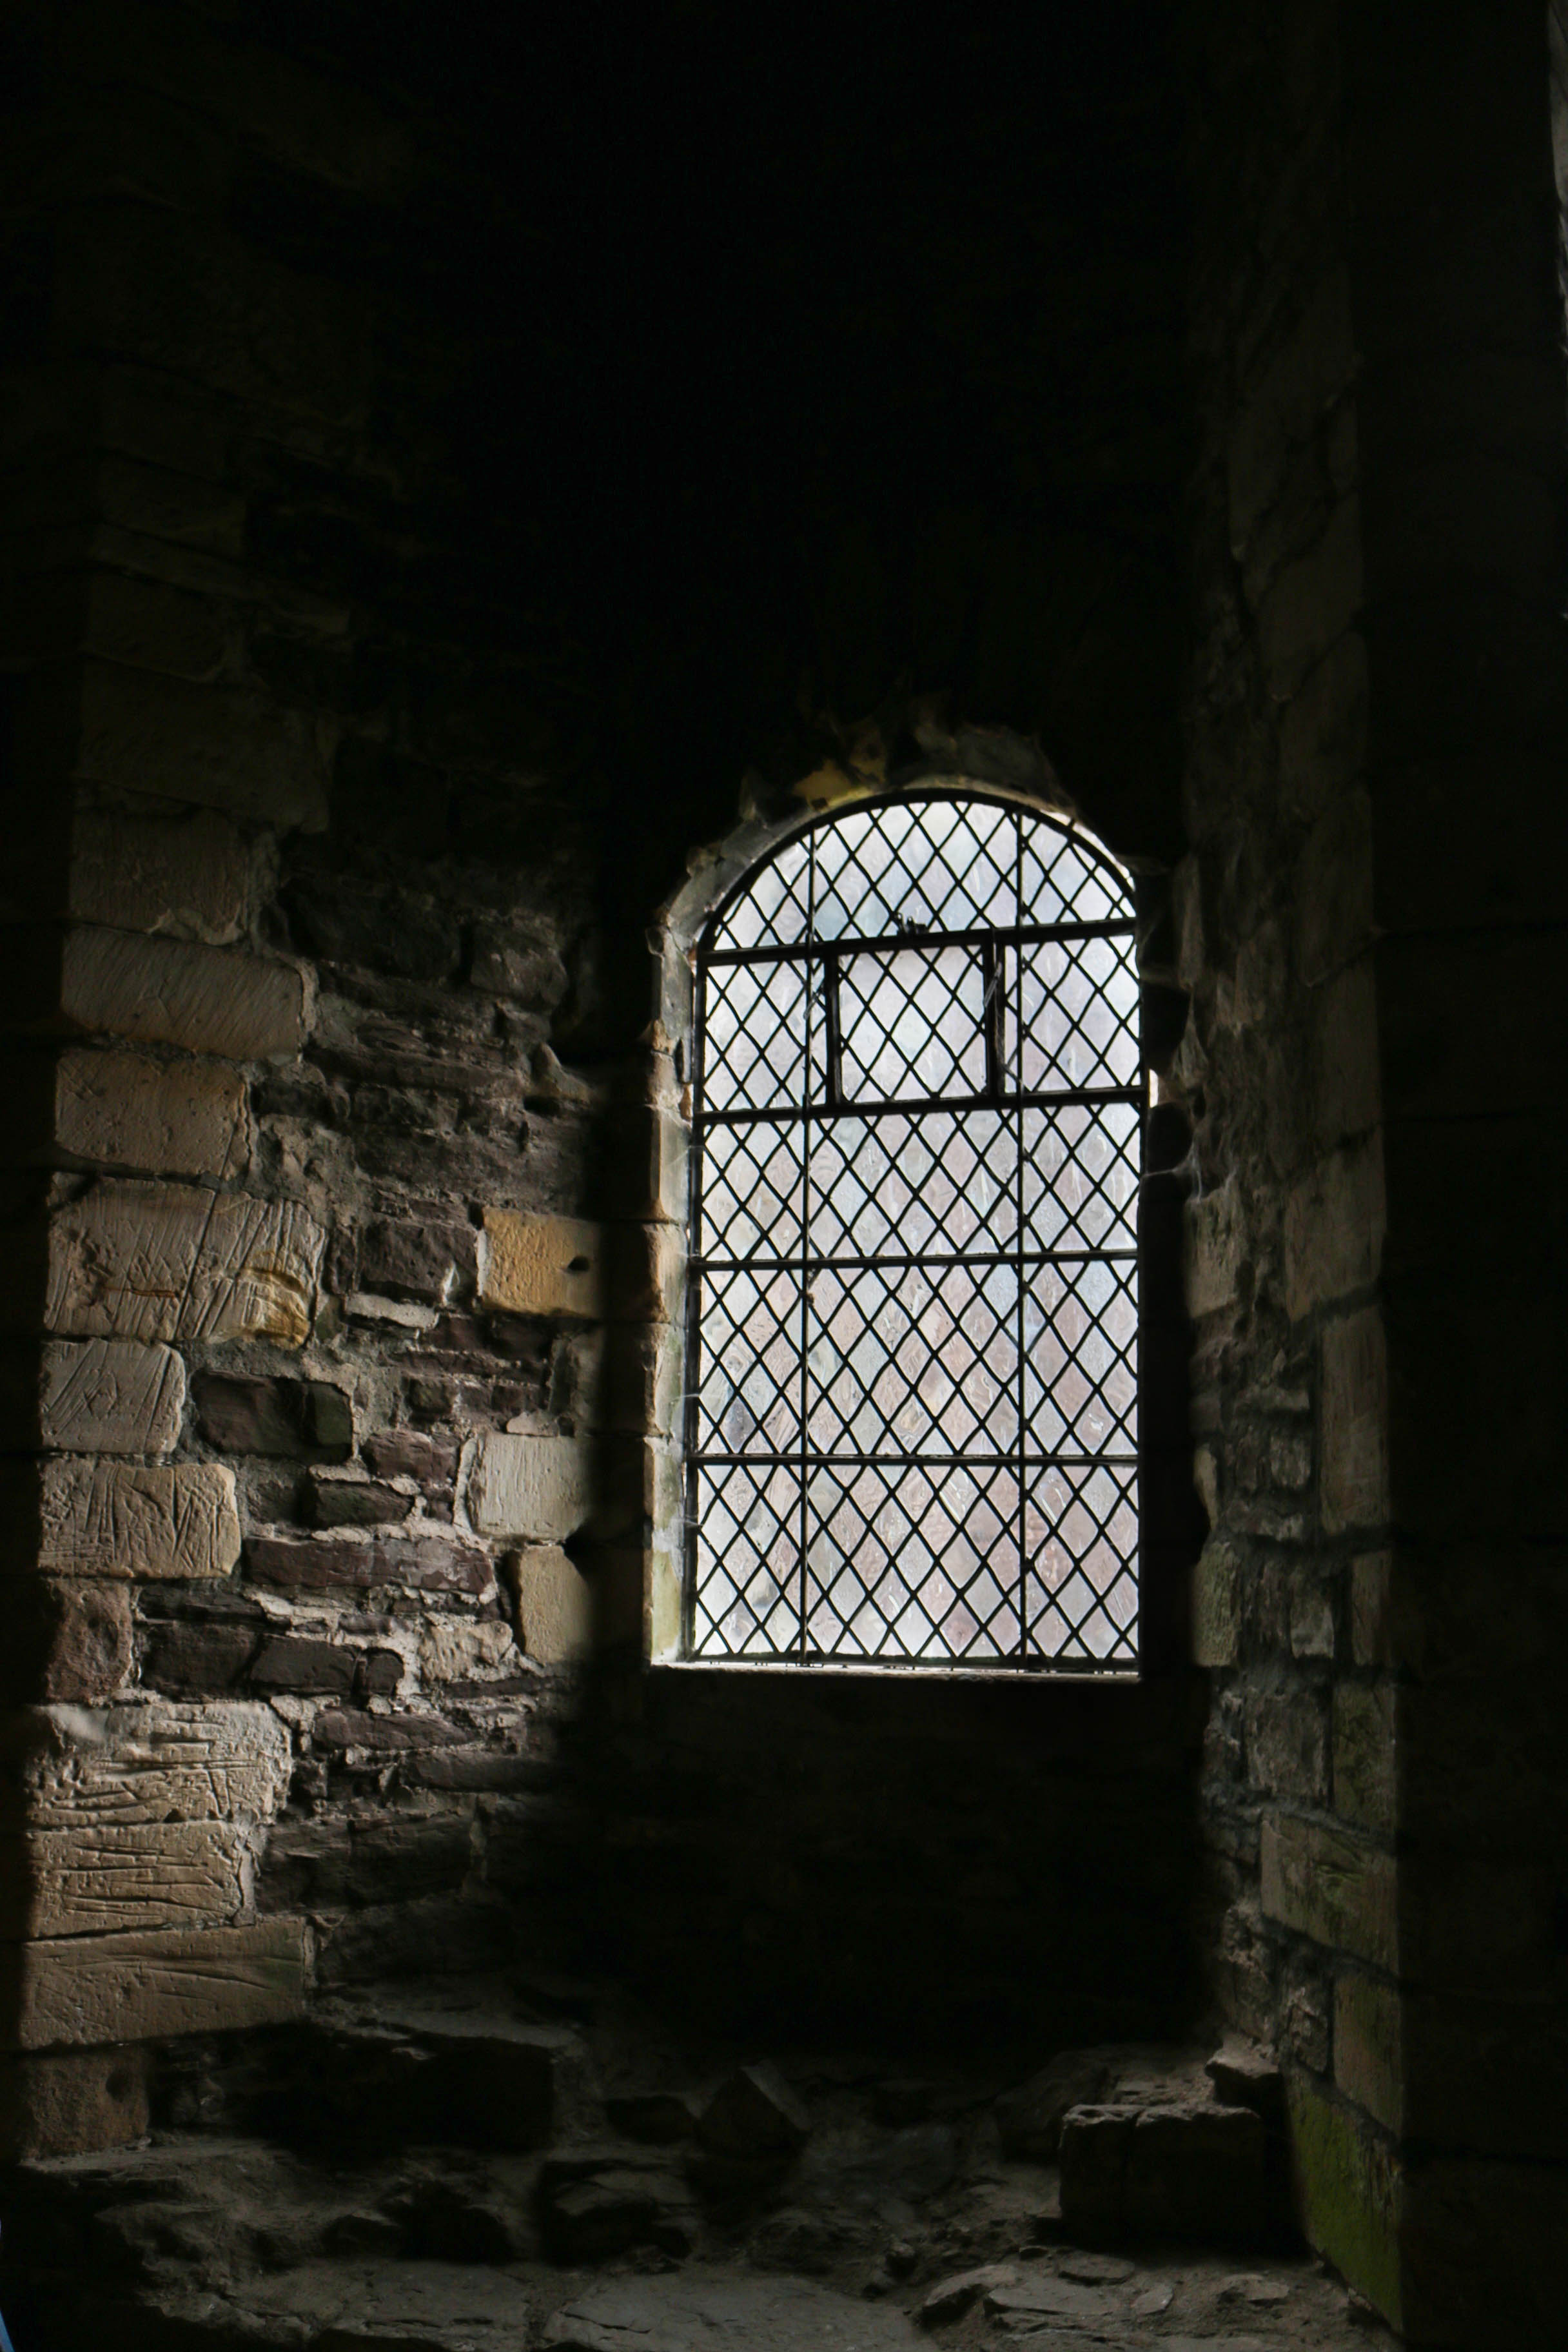 doune castle - castle leoch dans Outlander - road trip en ecosse